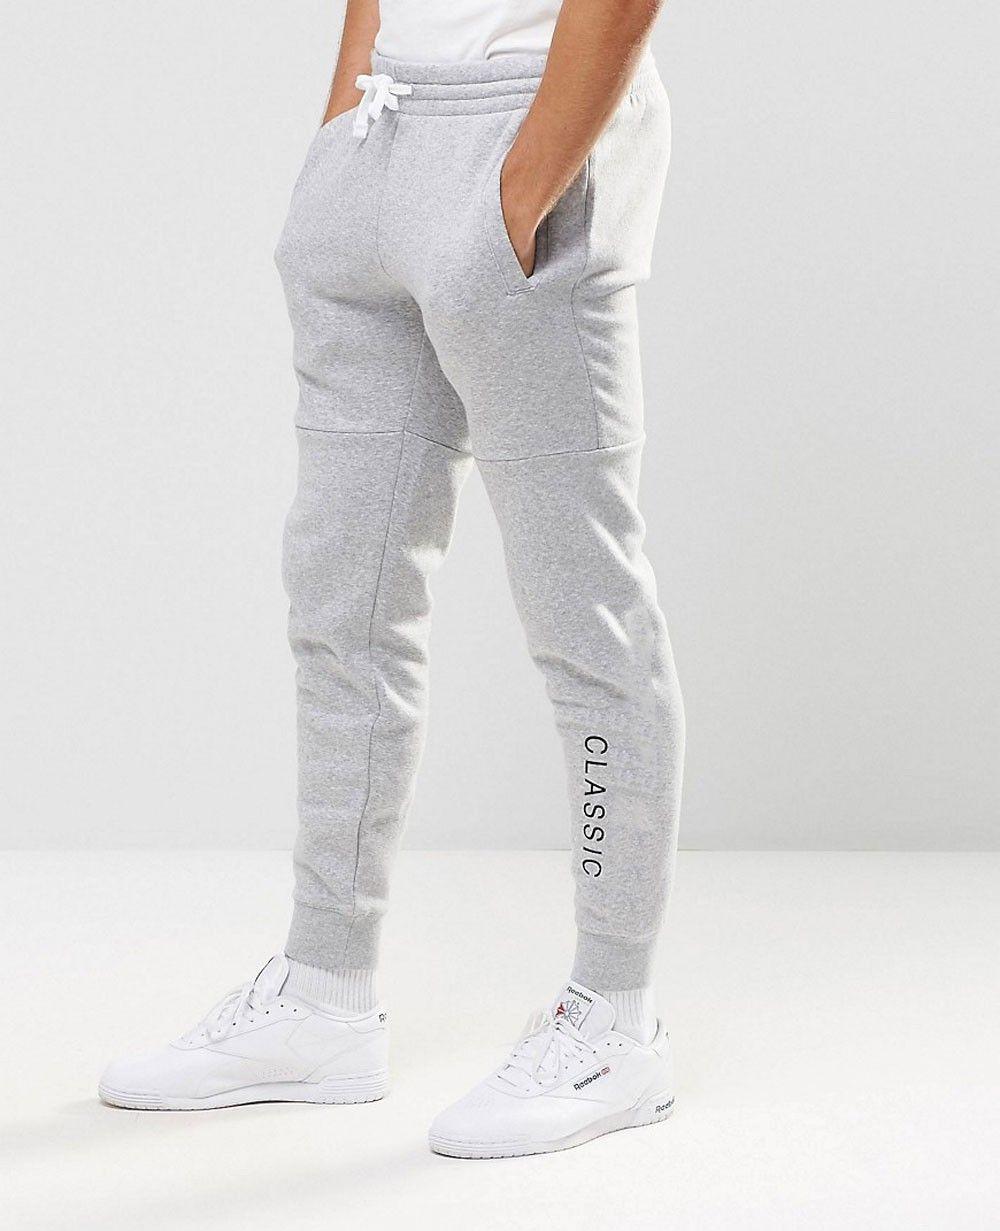 men joggers in grey